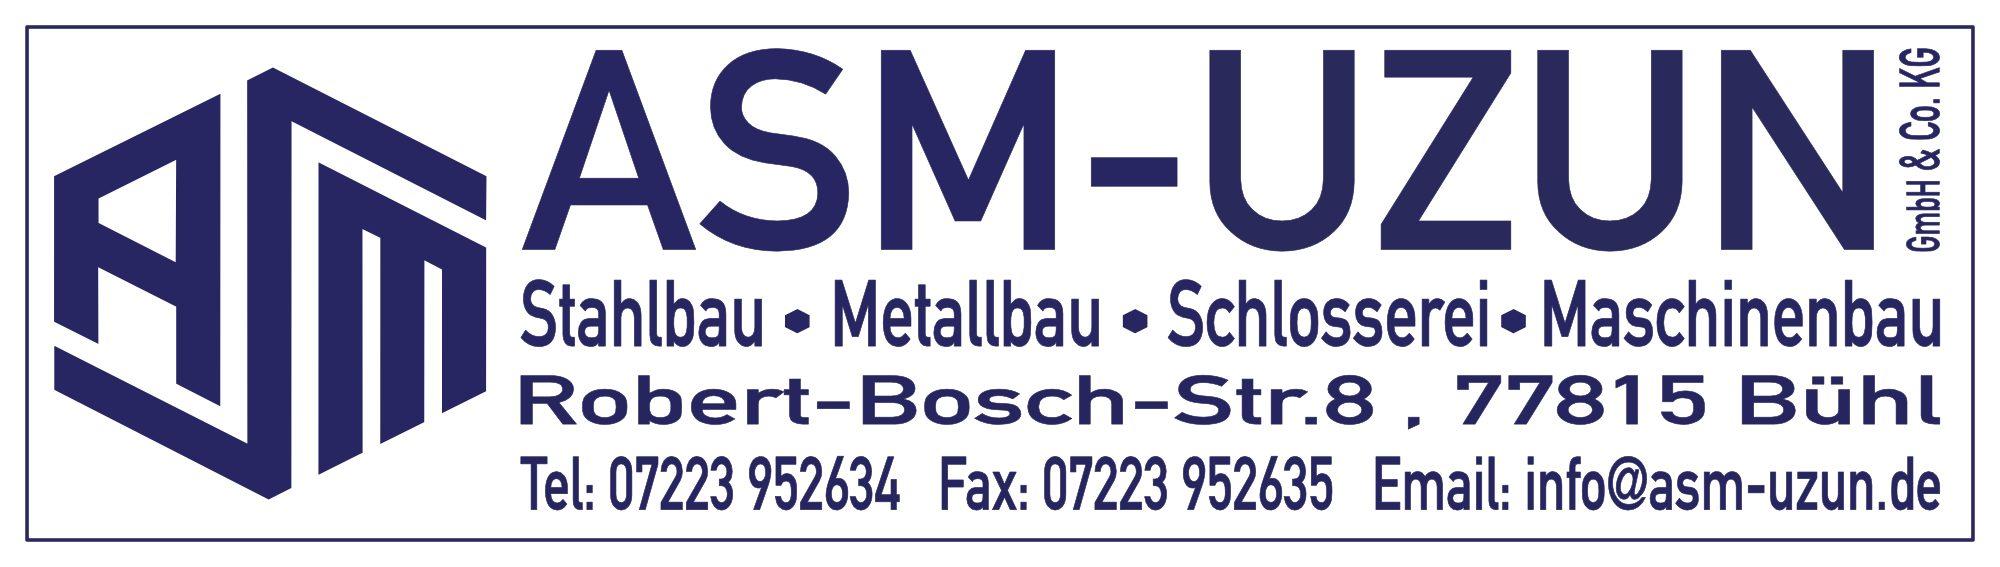 ASM-UZUN GmbH & Co. KG